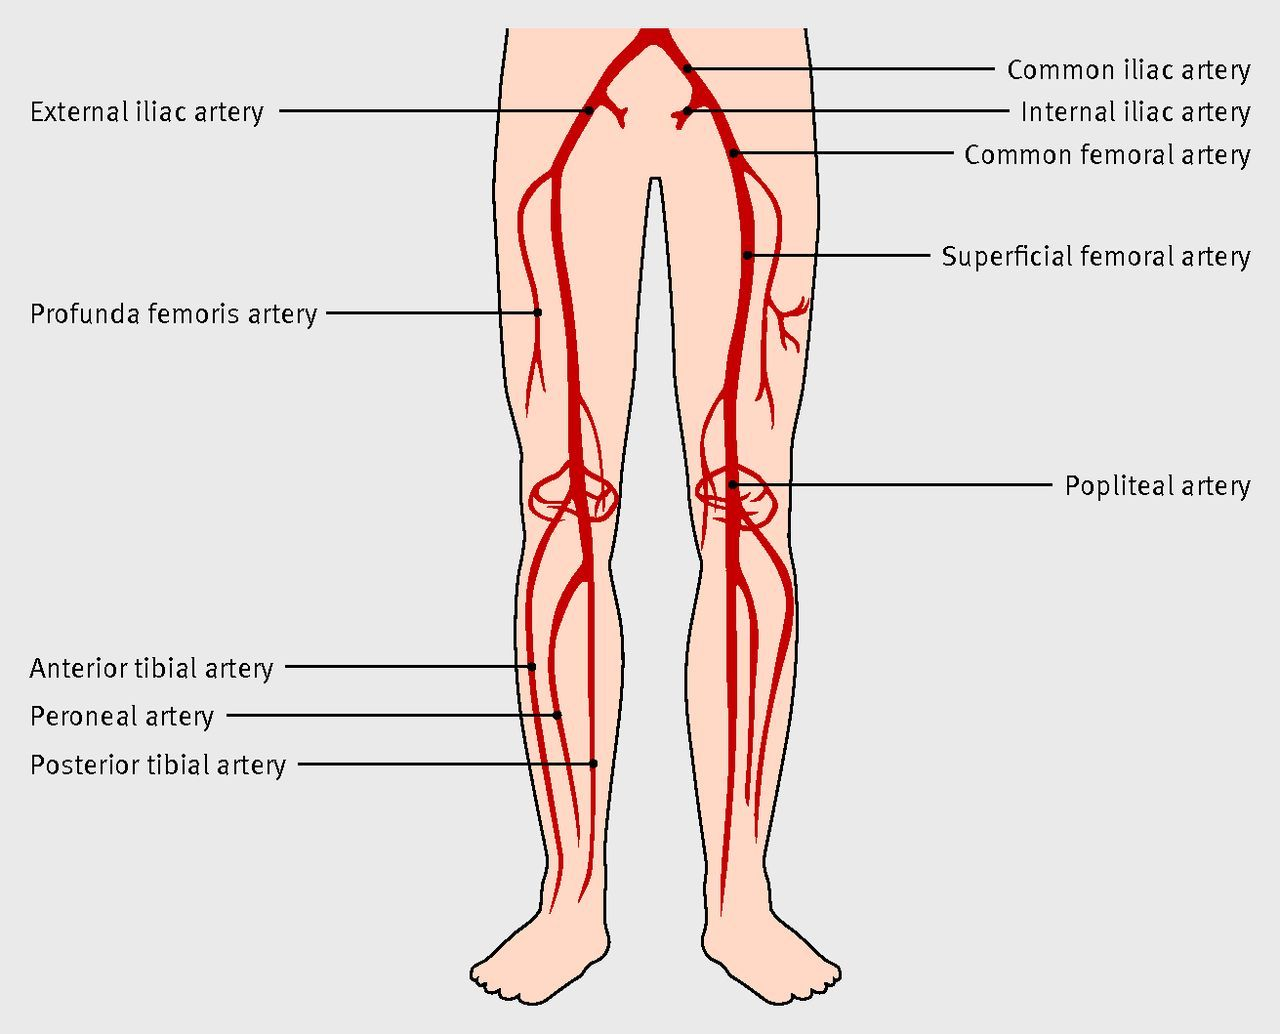 Arteries of the lower limb http://www.bmj.com/content/345/bmj.e5208 ...